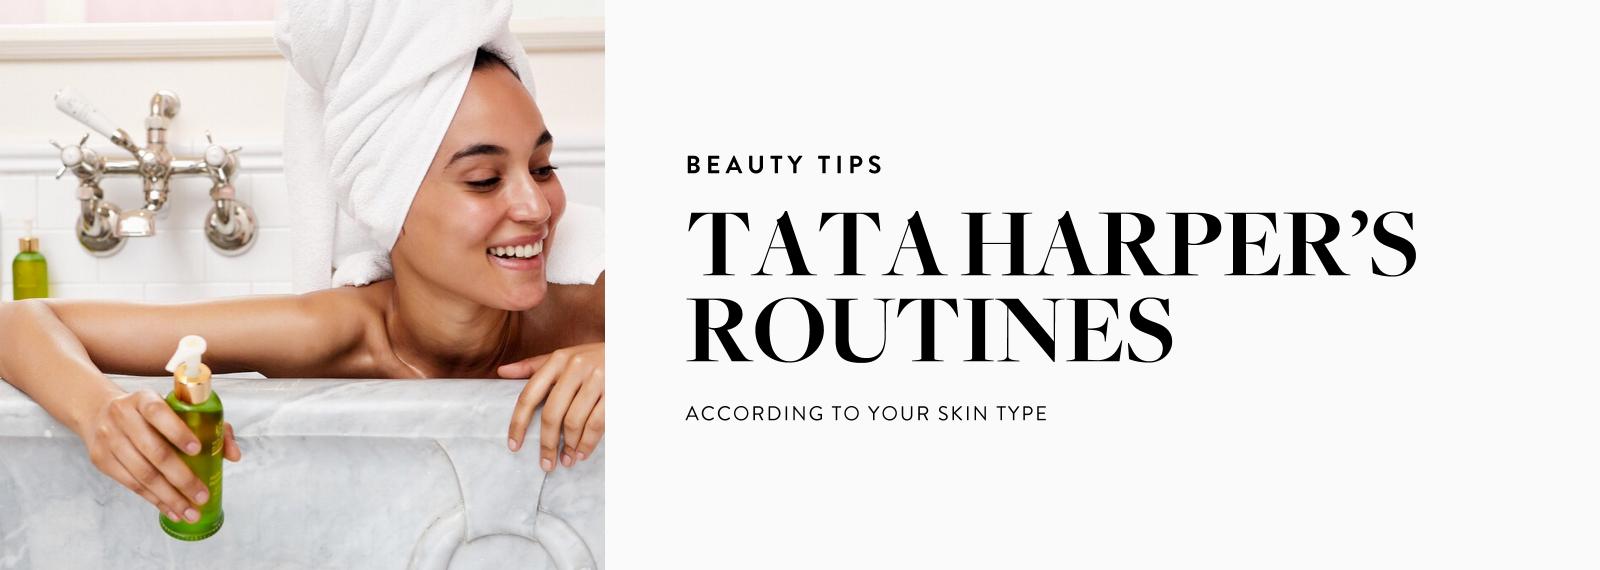 Beauty Tips - Tata Harper's Routines